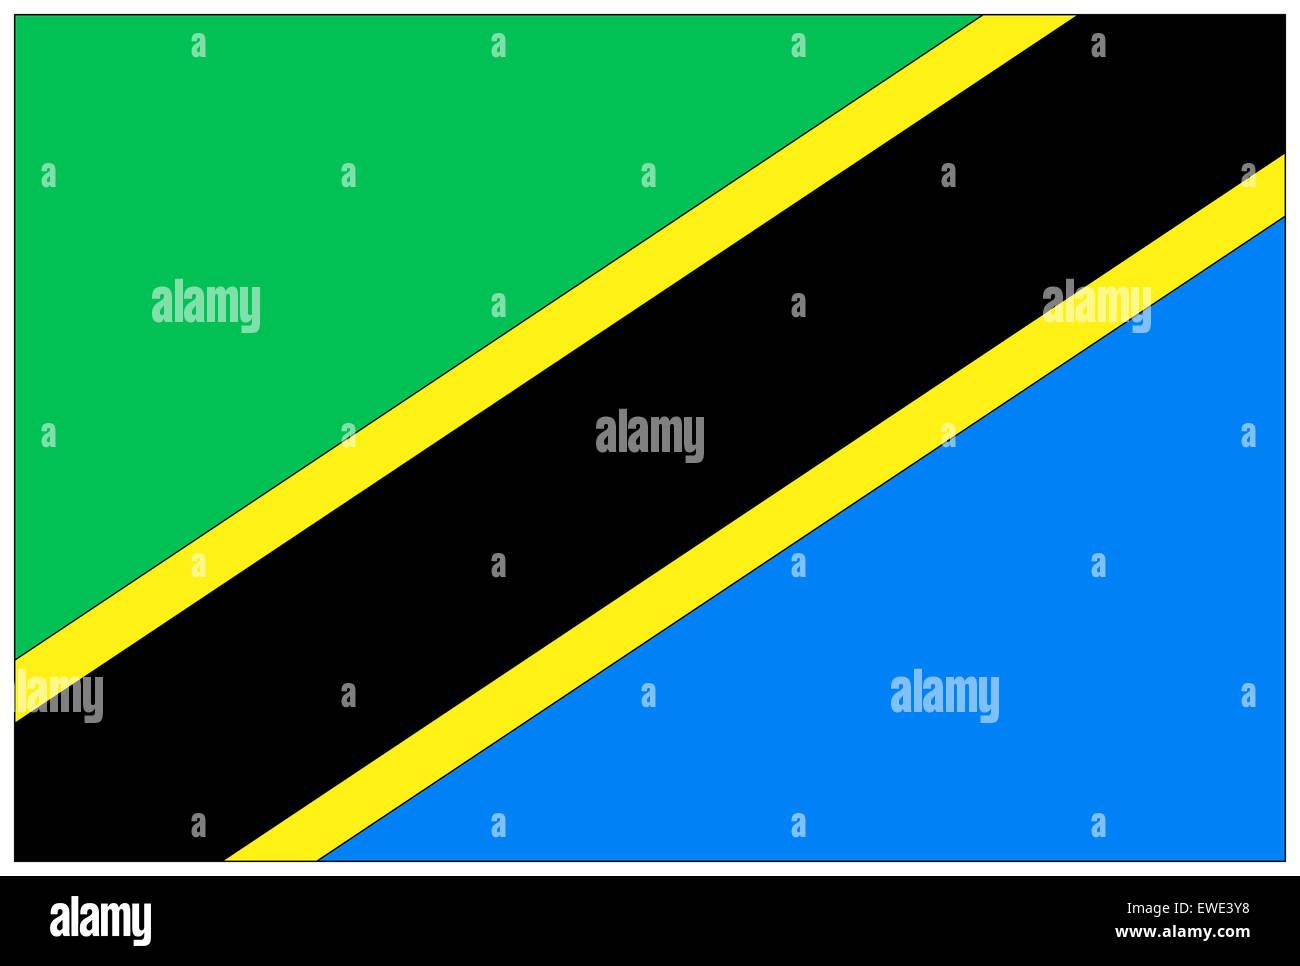 Fahne: Tansania/ flag: Tanzania. - Stock Image